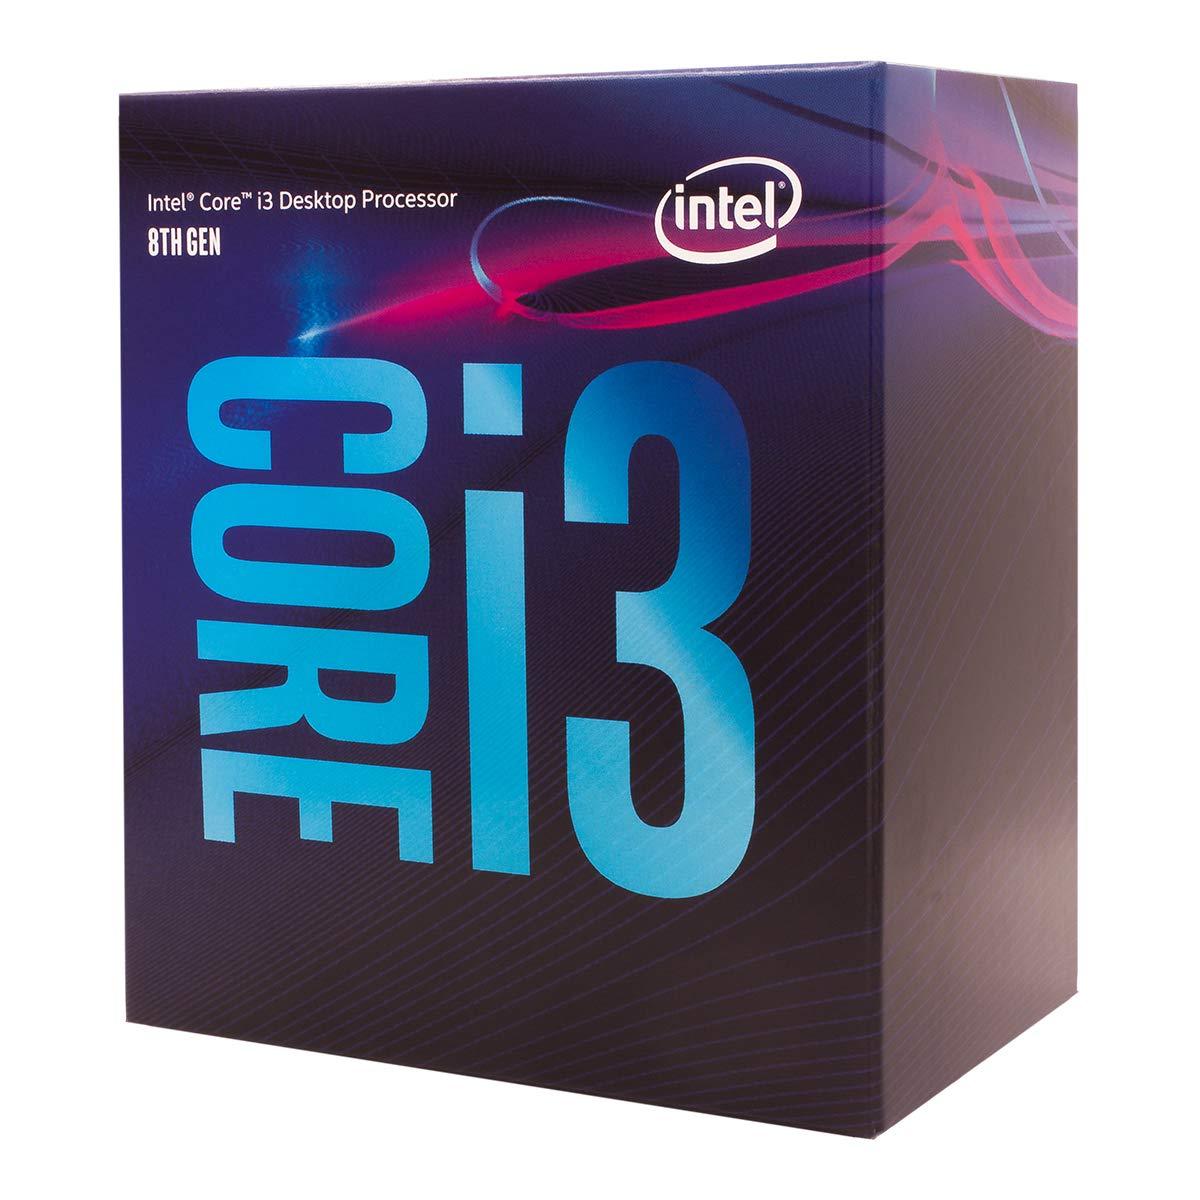 Intel i3 8100 3.6GHz